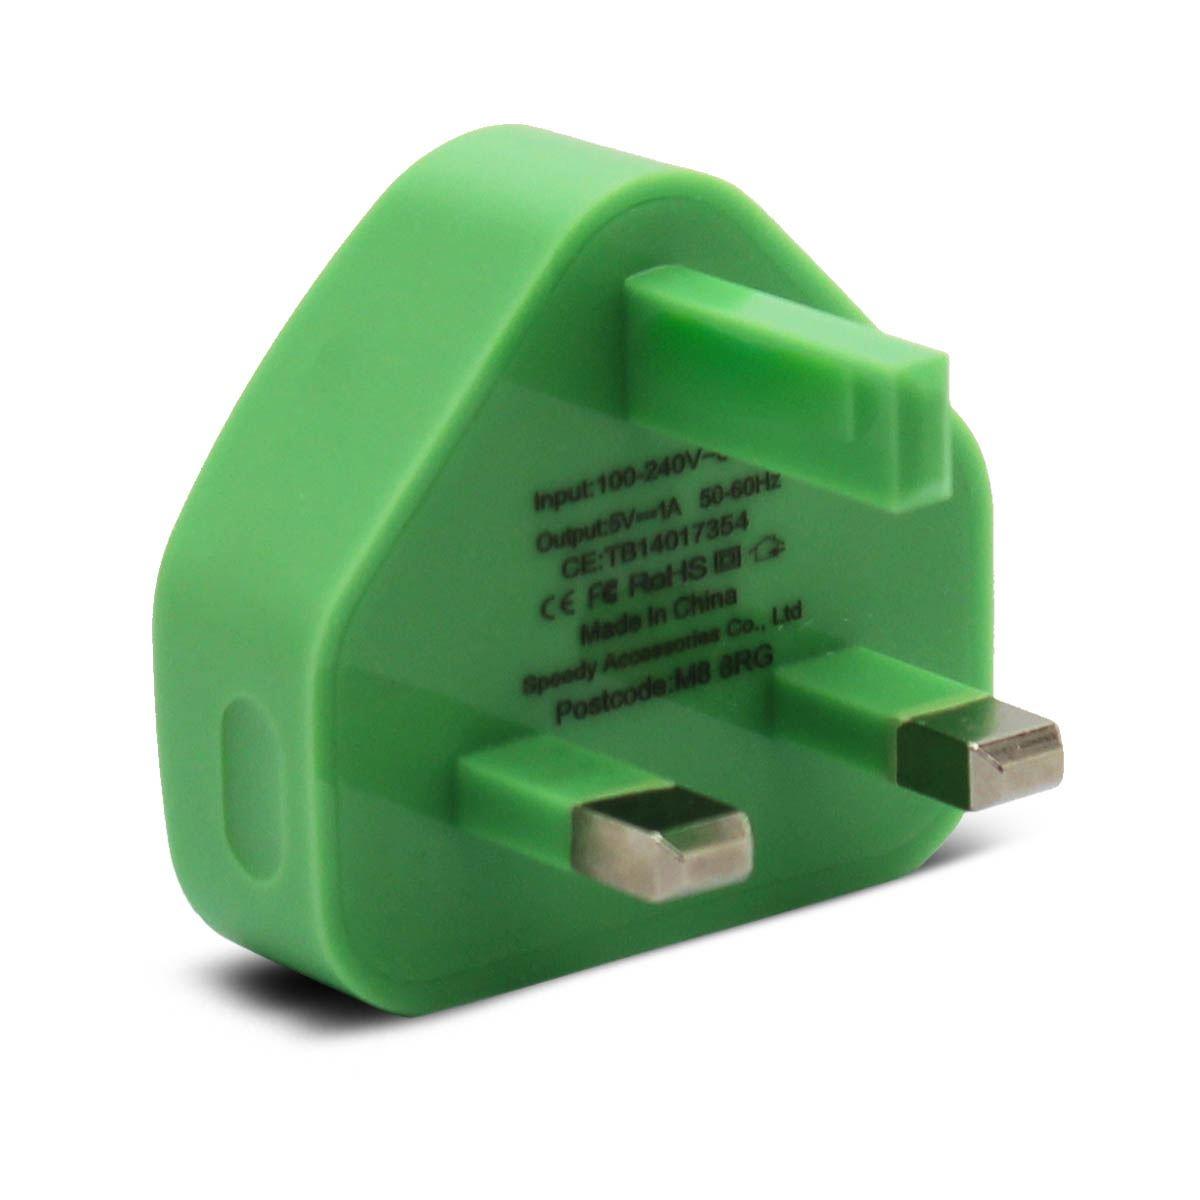 CE-UK-Mains-Wall-3-Pin-USB-Plug-Power-Adaptor-Charger-Samsung-Galaxy-S3-S4-S5-S6